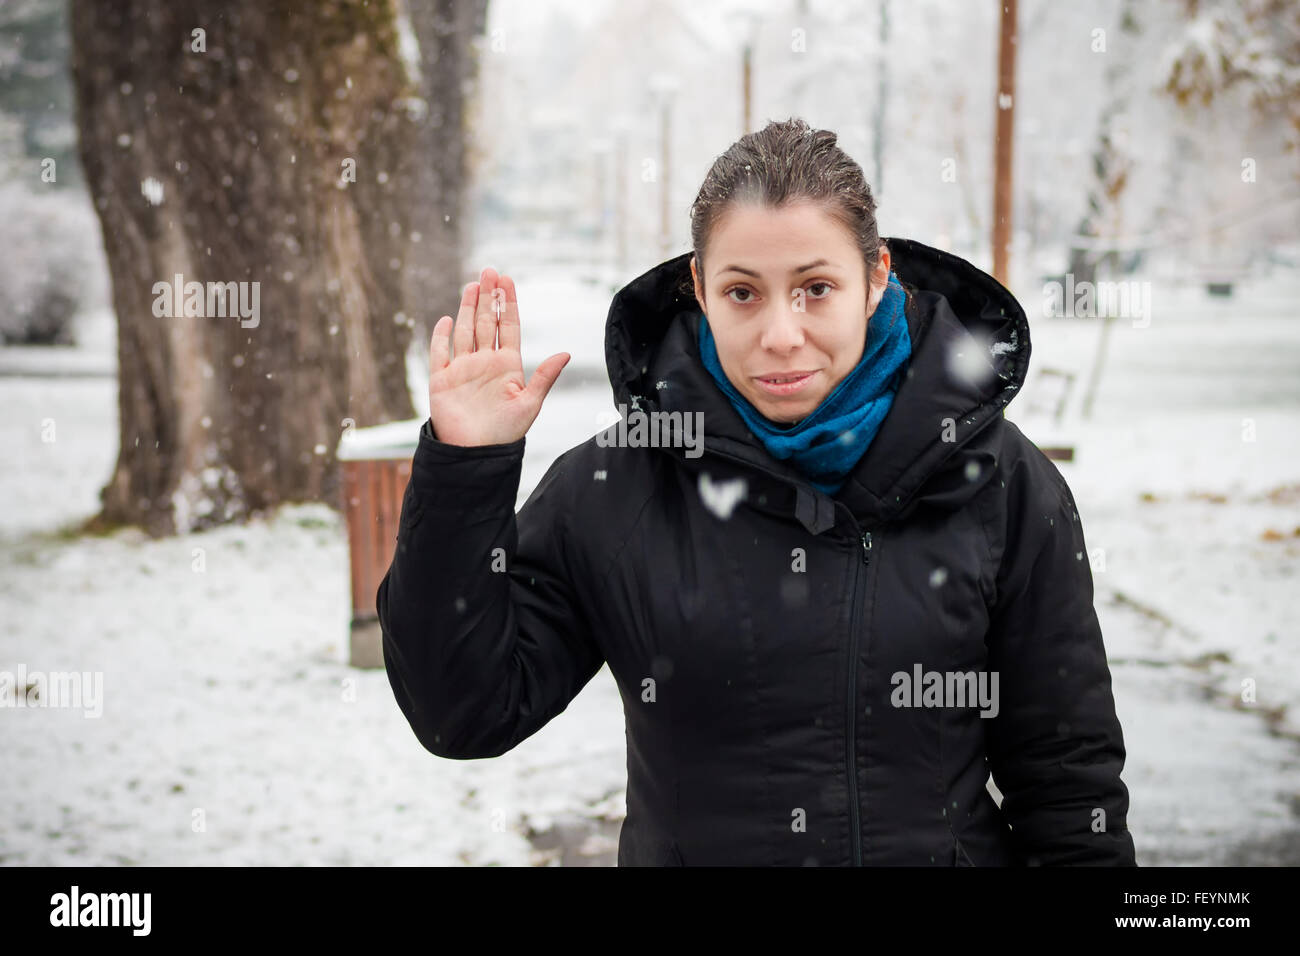 Woman taking an oath in a park in falling snow - Stock Image